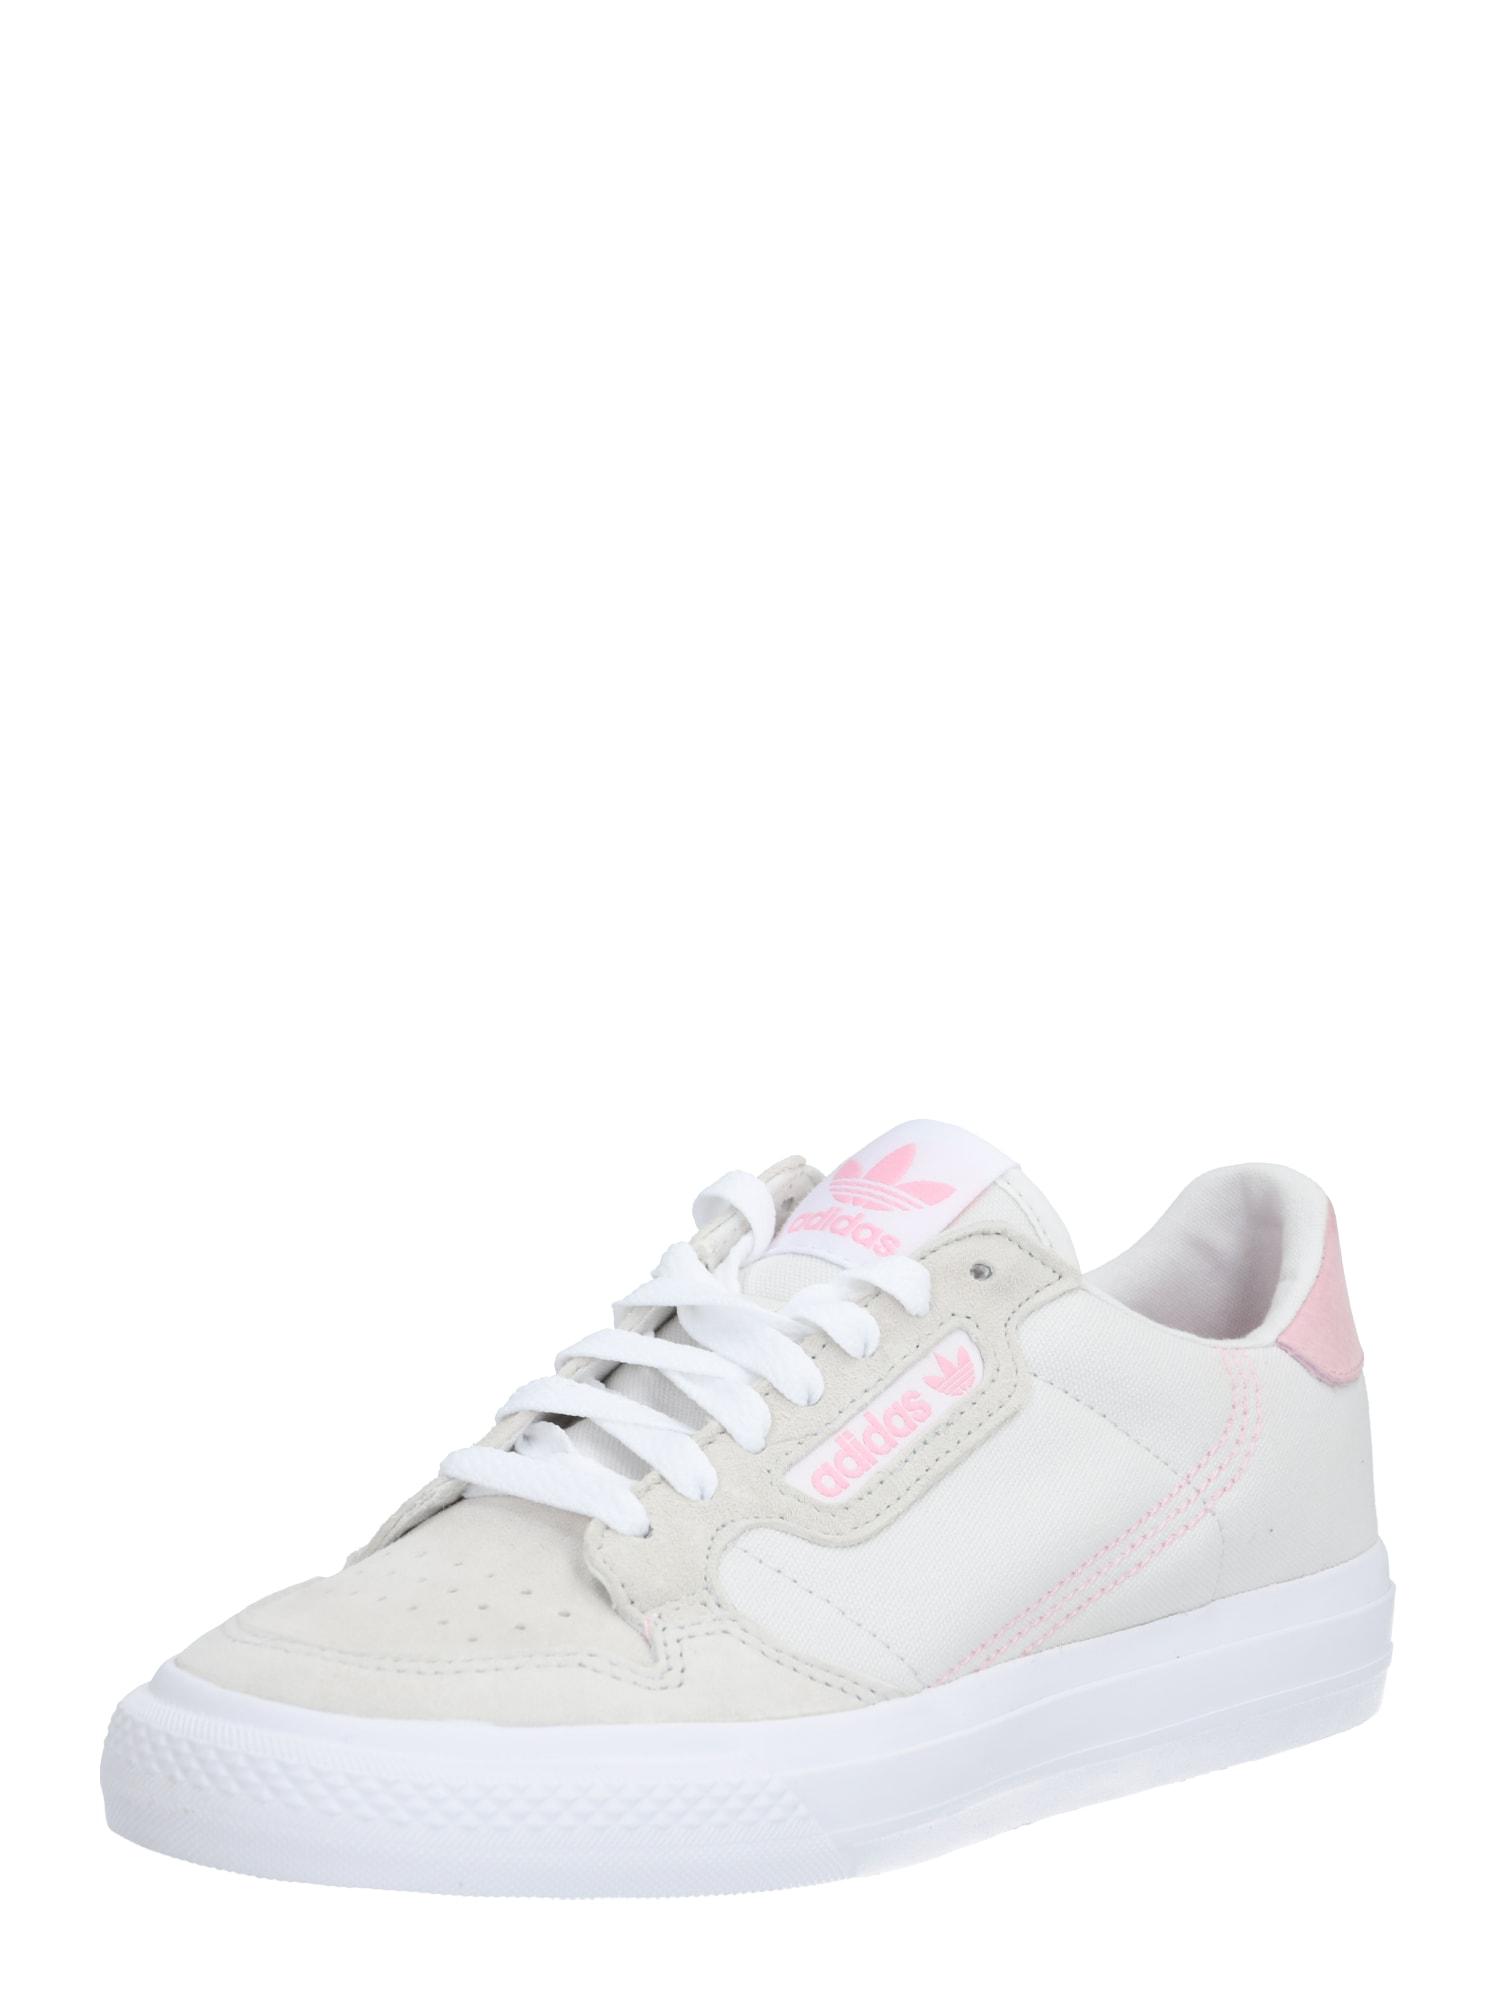 ADIDAS ORIGINALS Nízke tenisky 'Continental'  biela / ružová / sivá